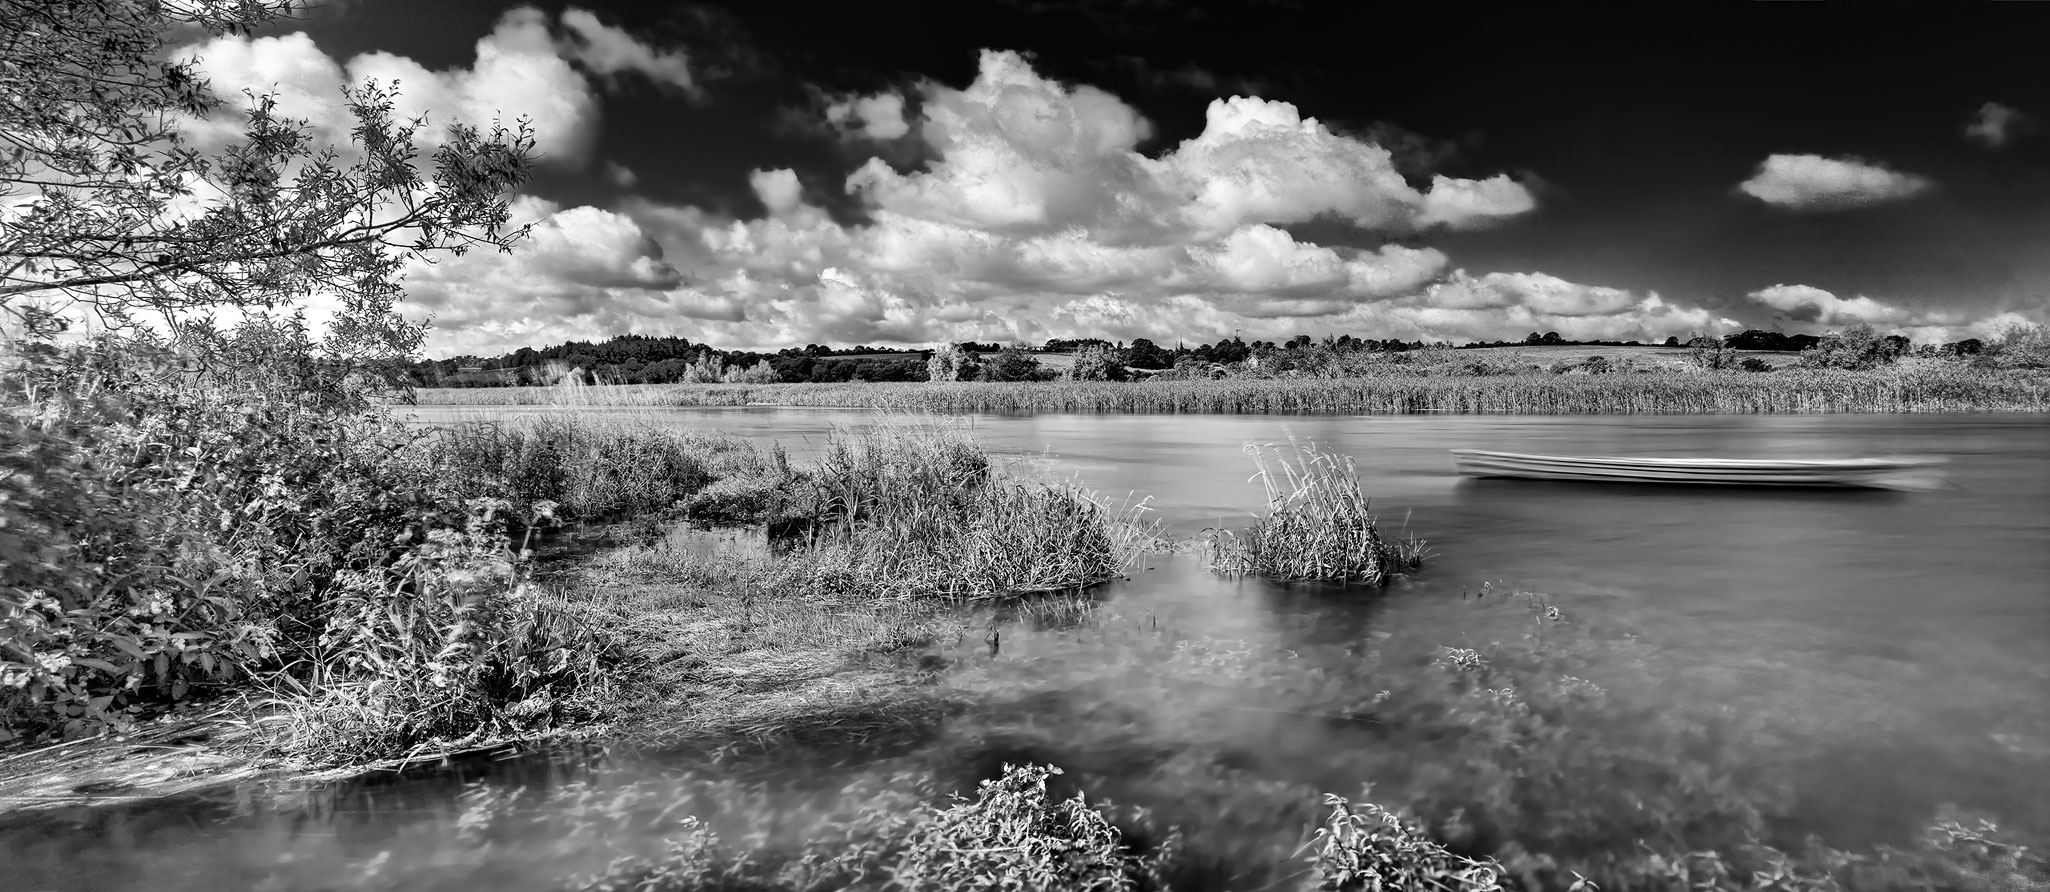 River Slaney Wexford the glen